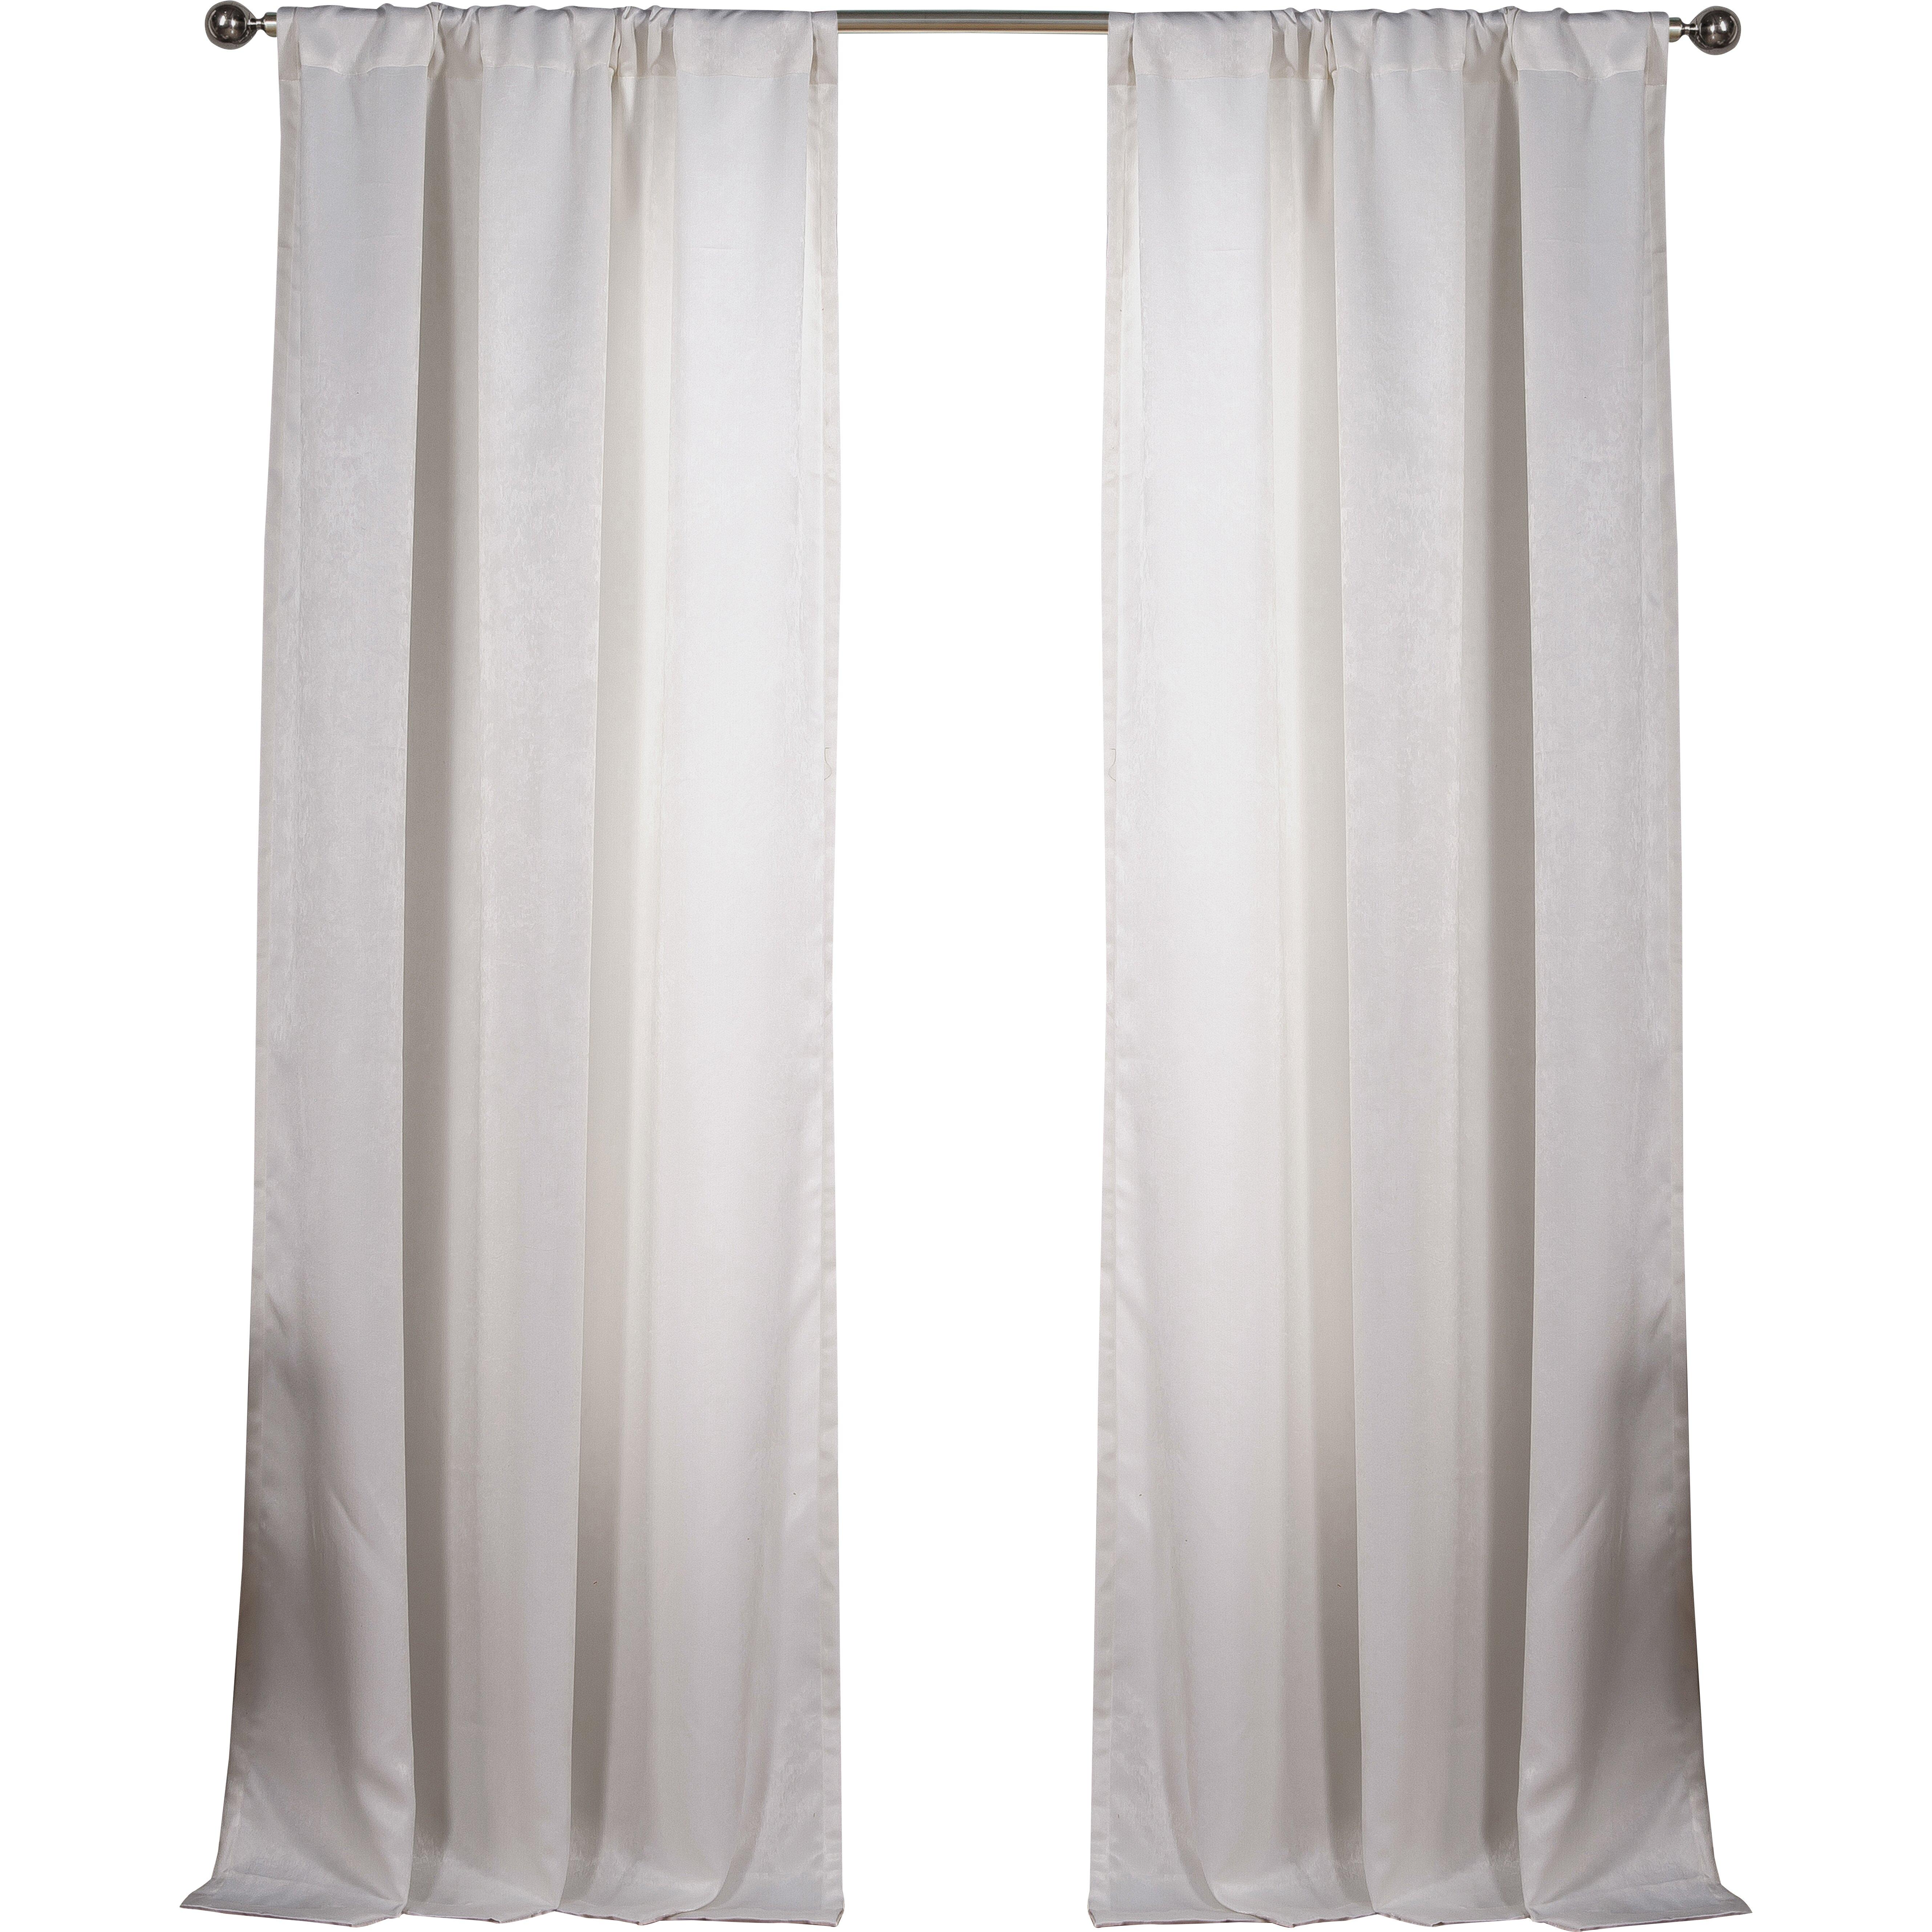 Dr International Blackout Rod Pocket Curtain Panel In White Wayfair